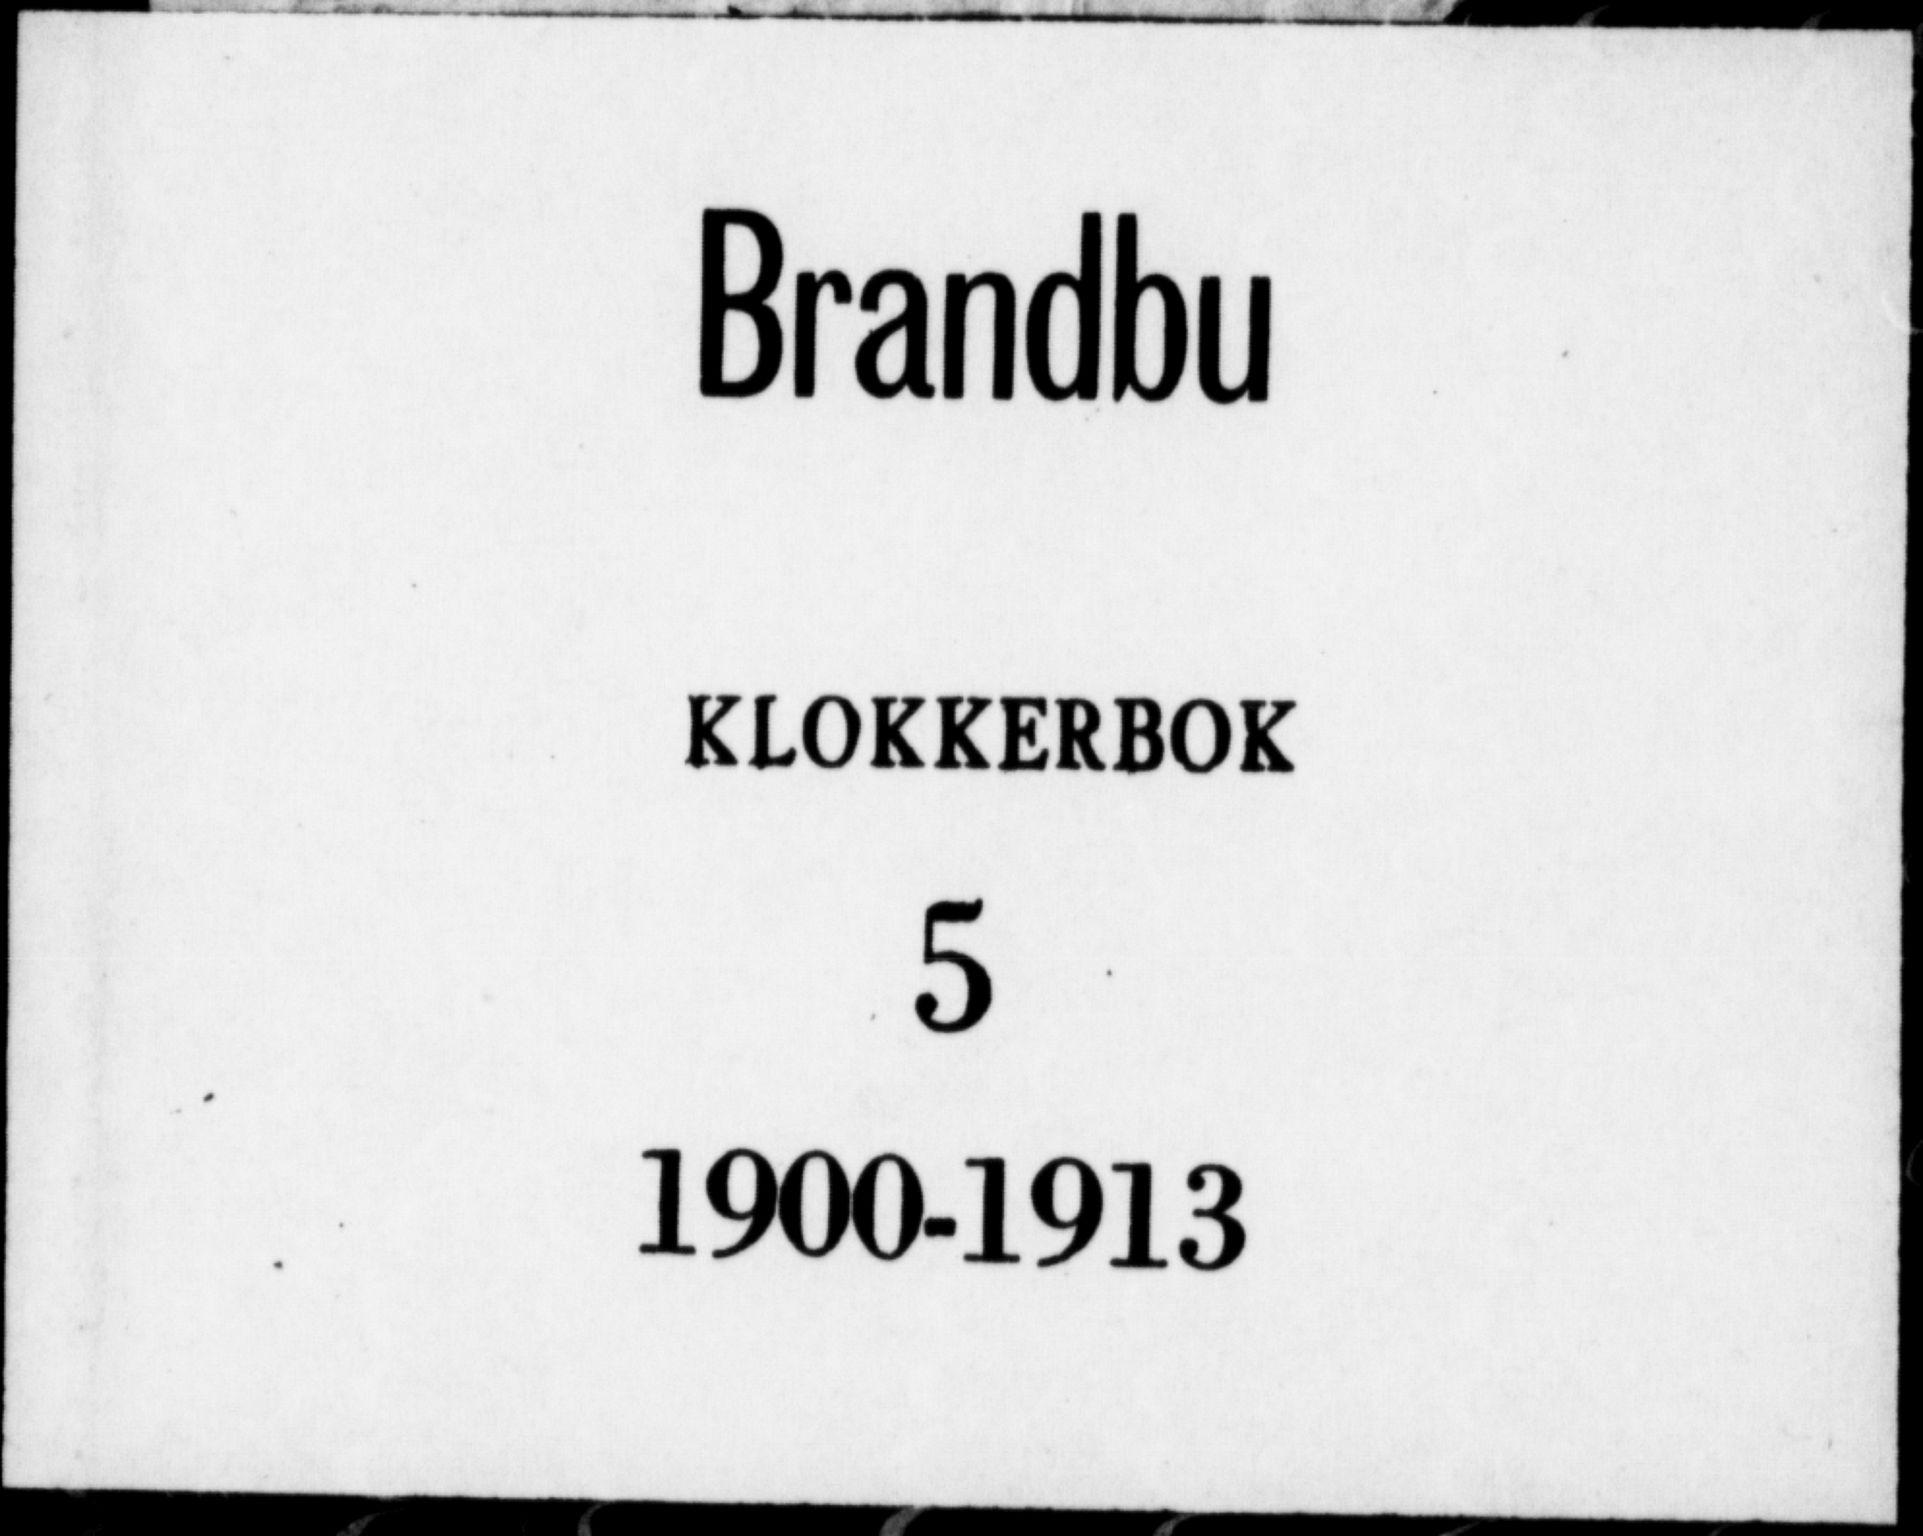 SAH, Brandbu prestekontor, Klokkerbok nr. 5, 1900-1913